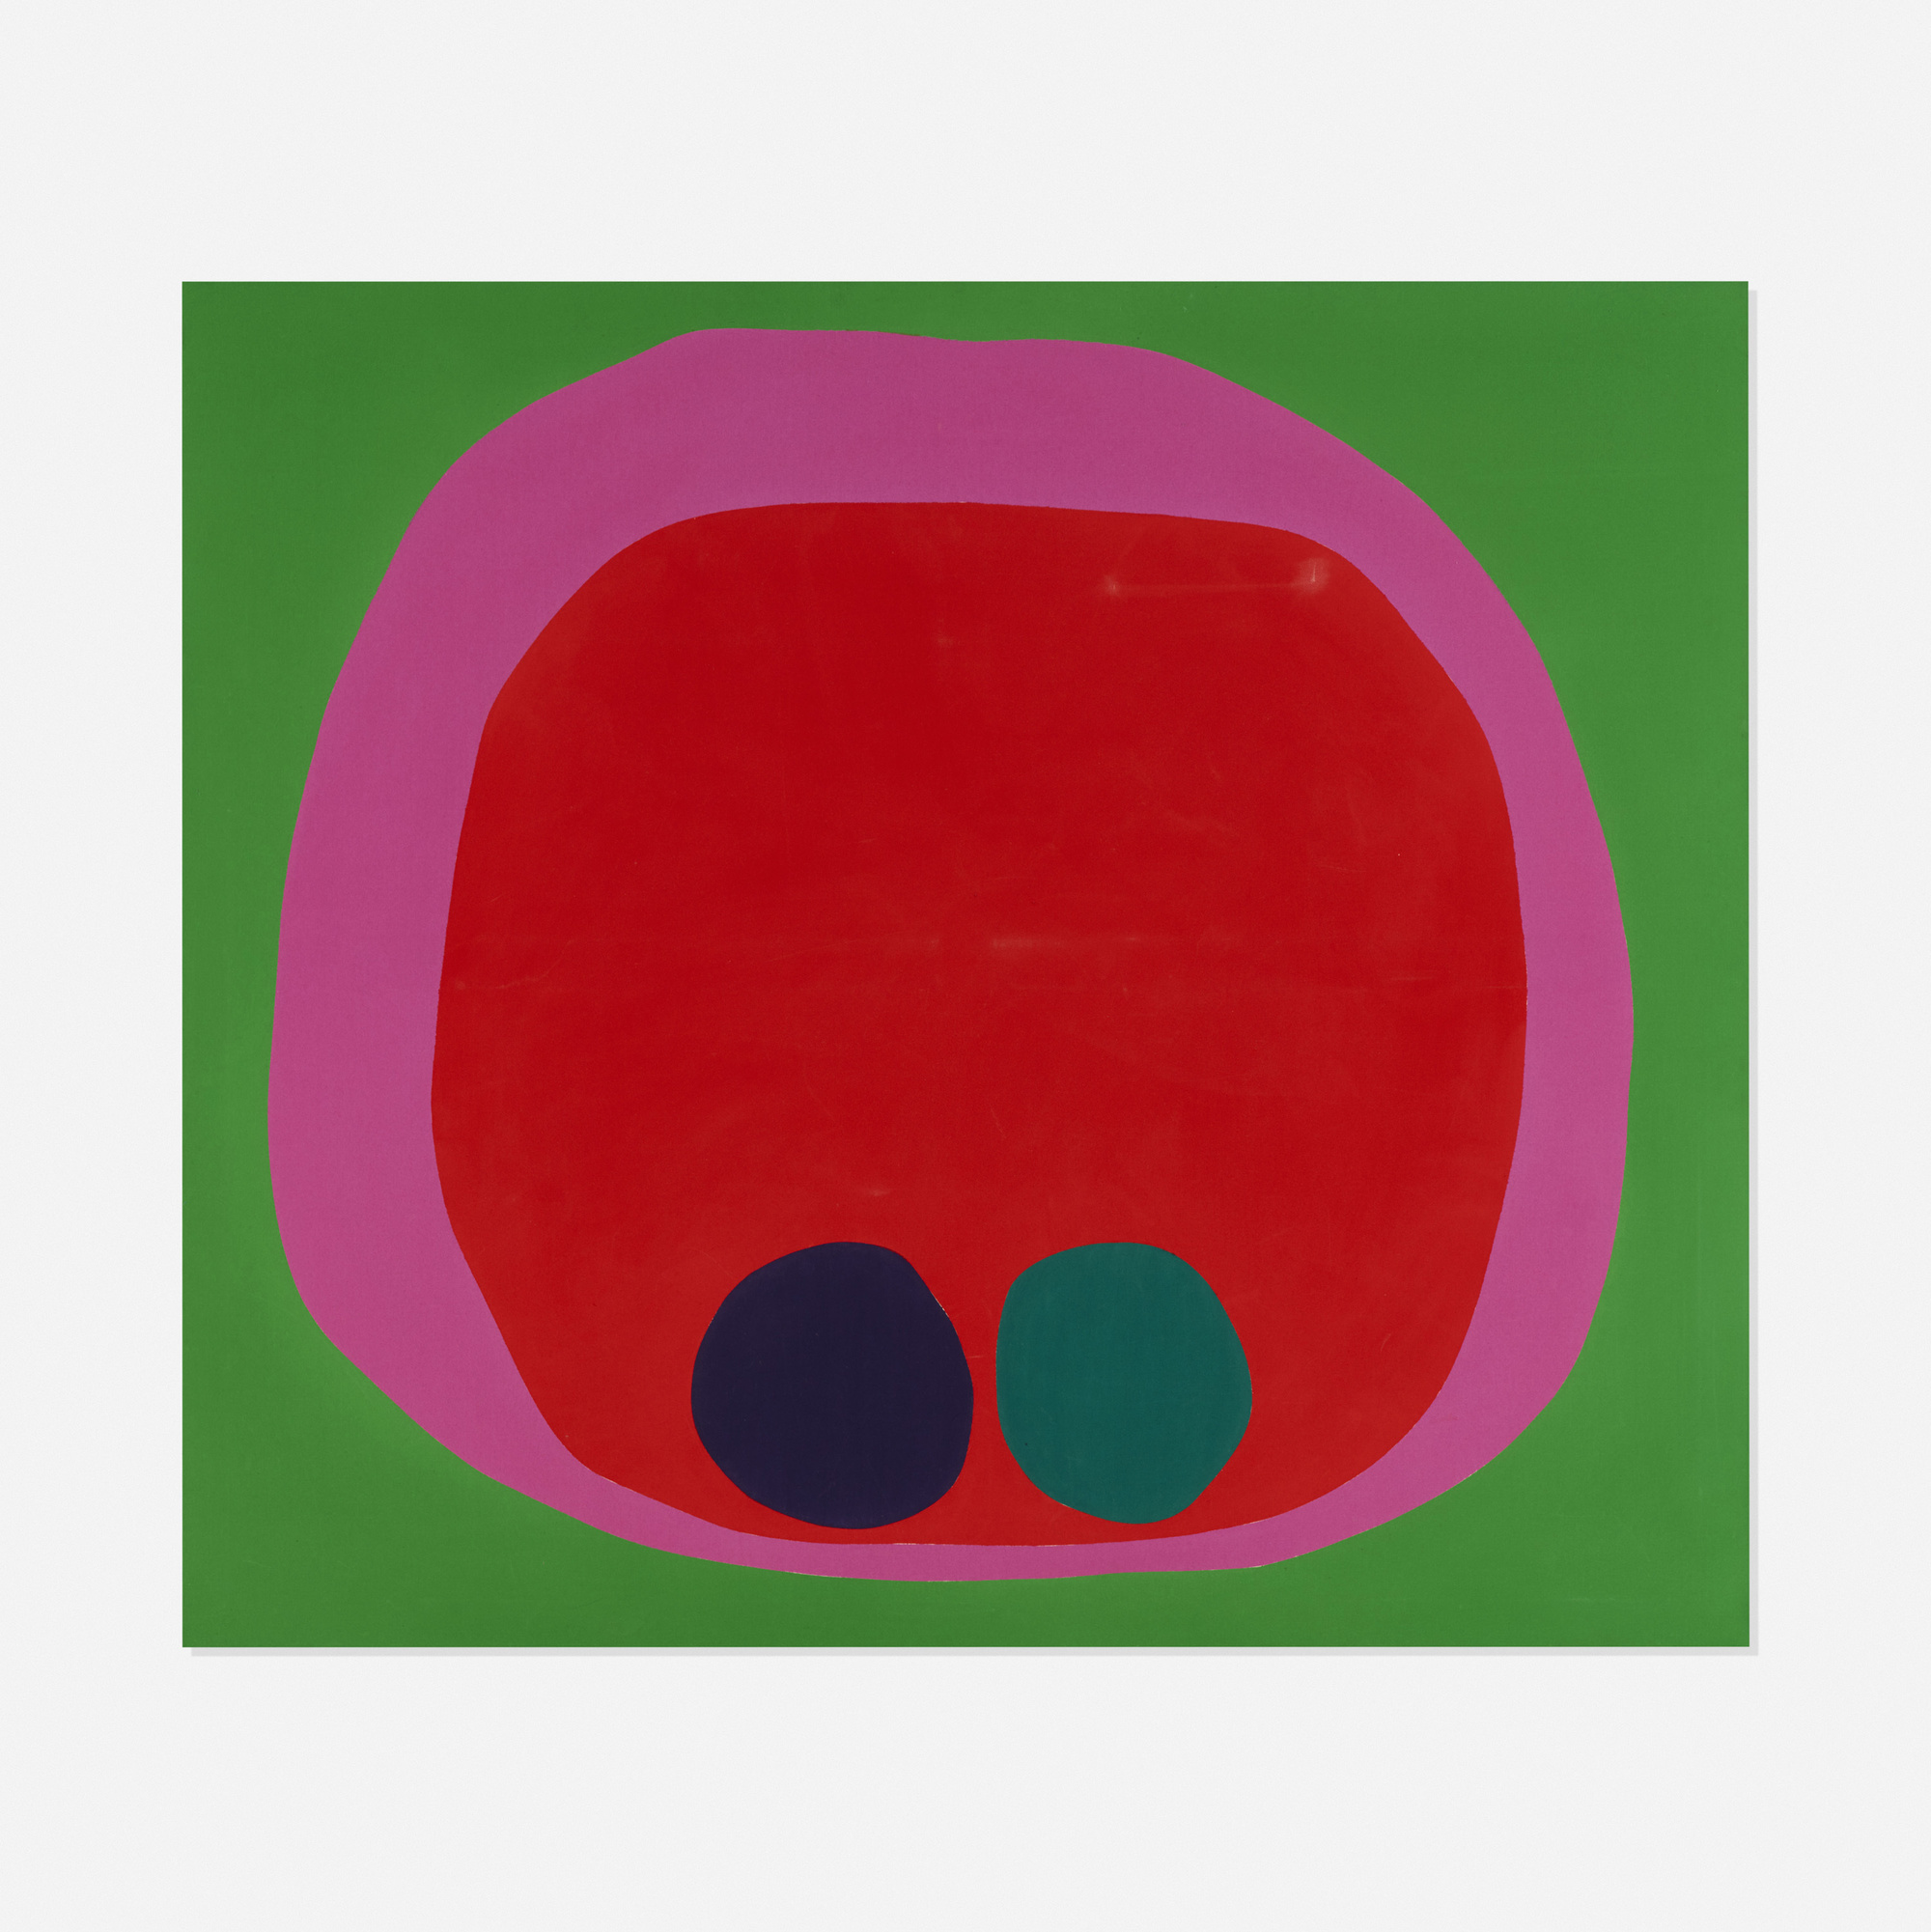 642: In the Manner of Jules Olitski / Untitled (1 of 1)